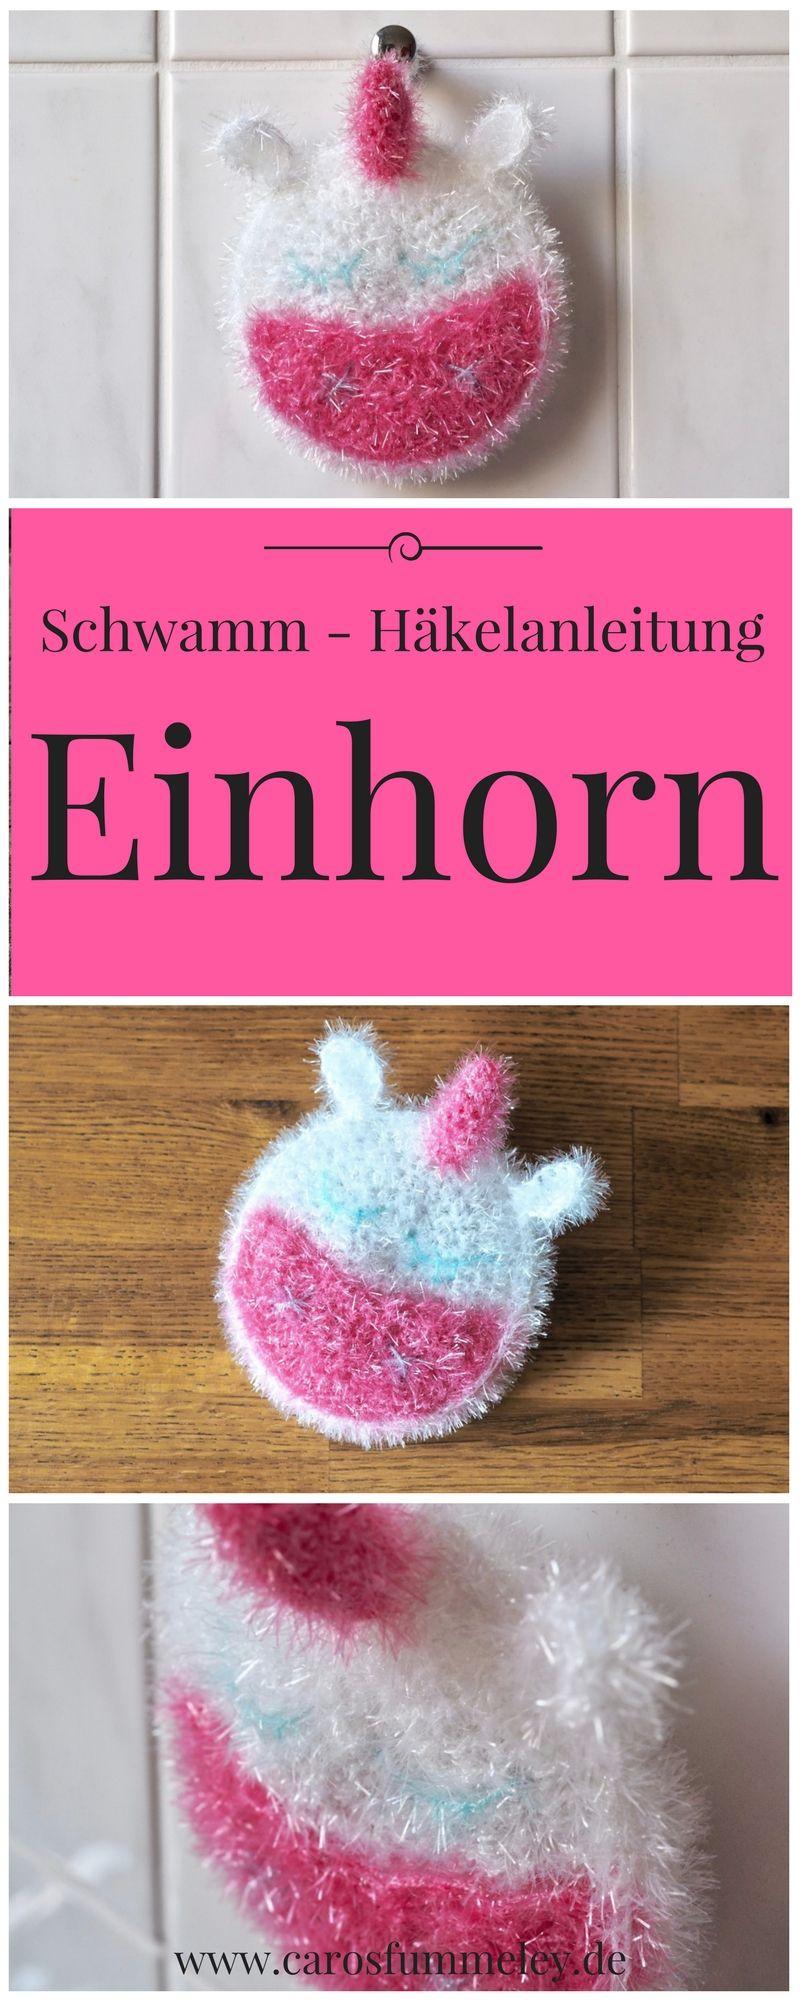 Häkelanleitung: Einhorn - Schwamm | Crochet, Creative and Haken